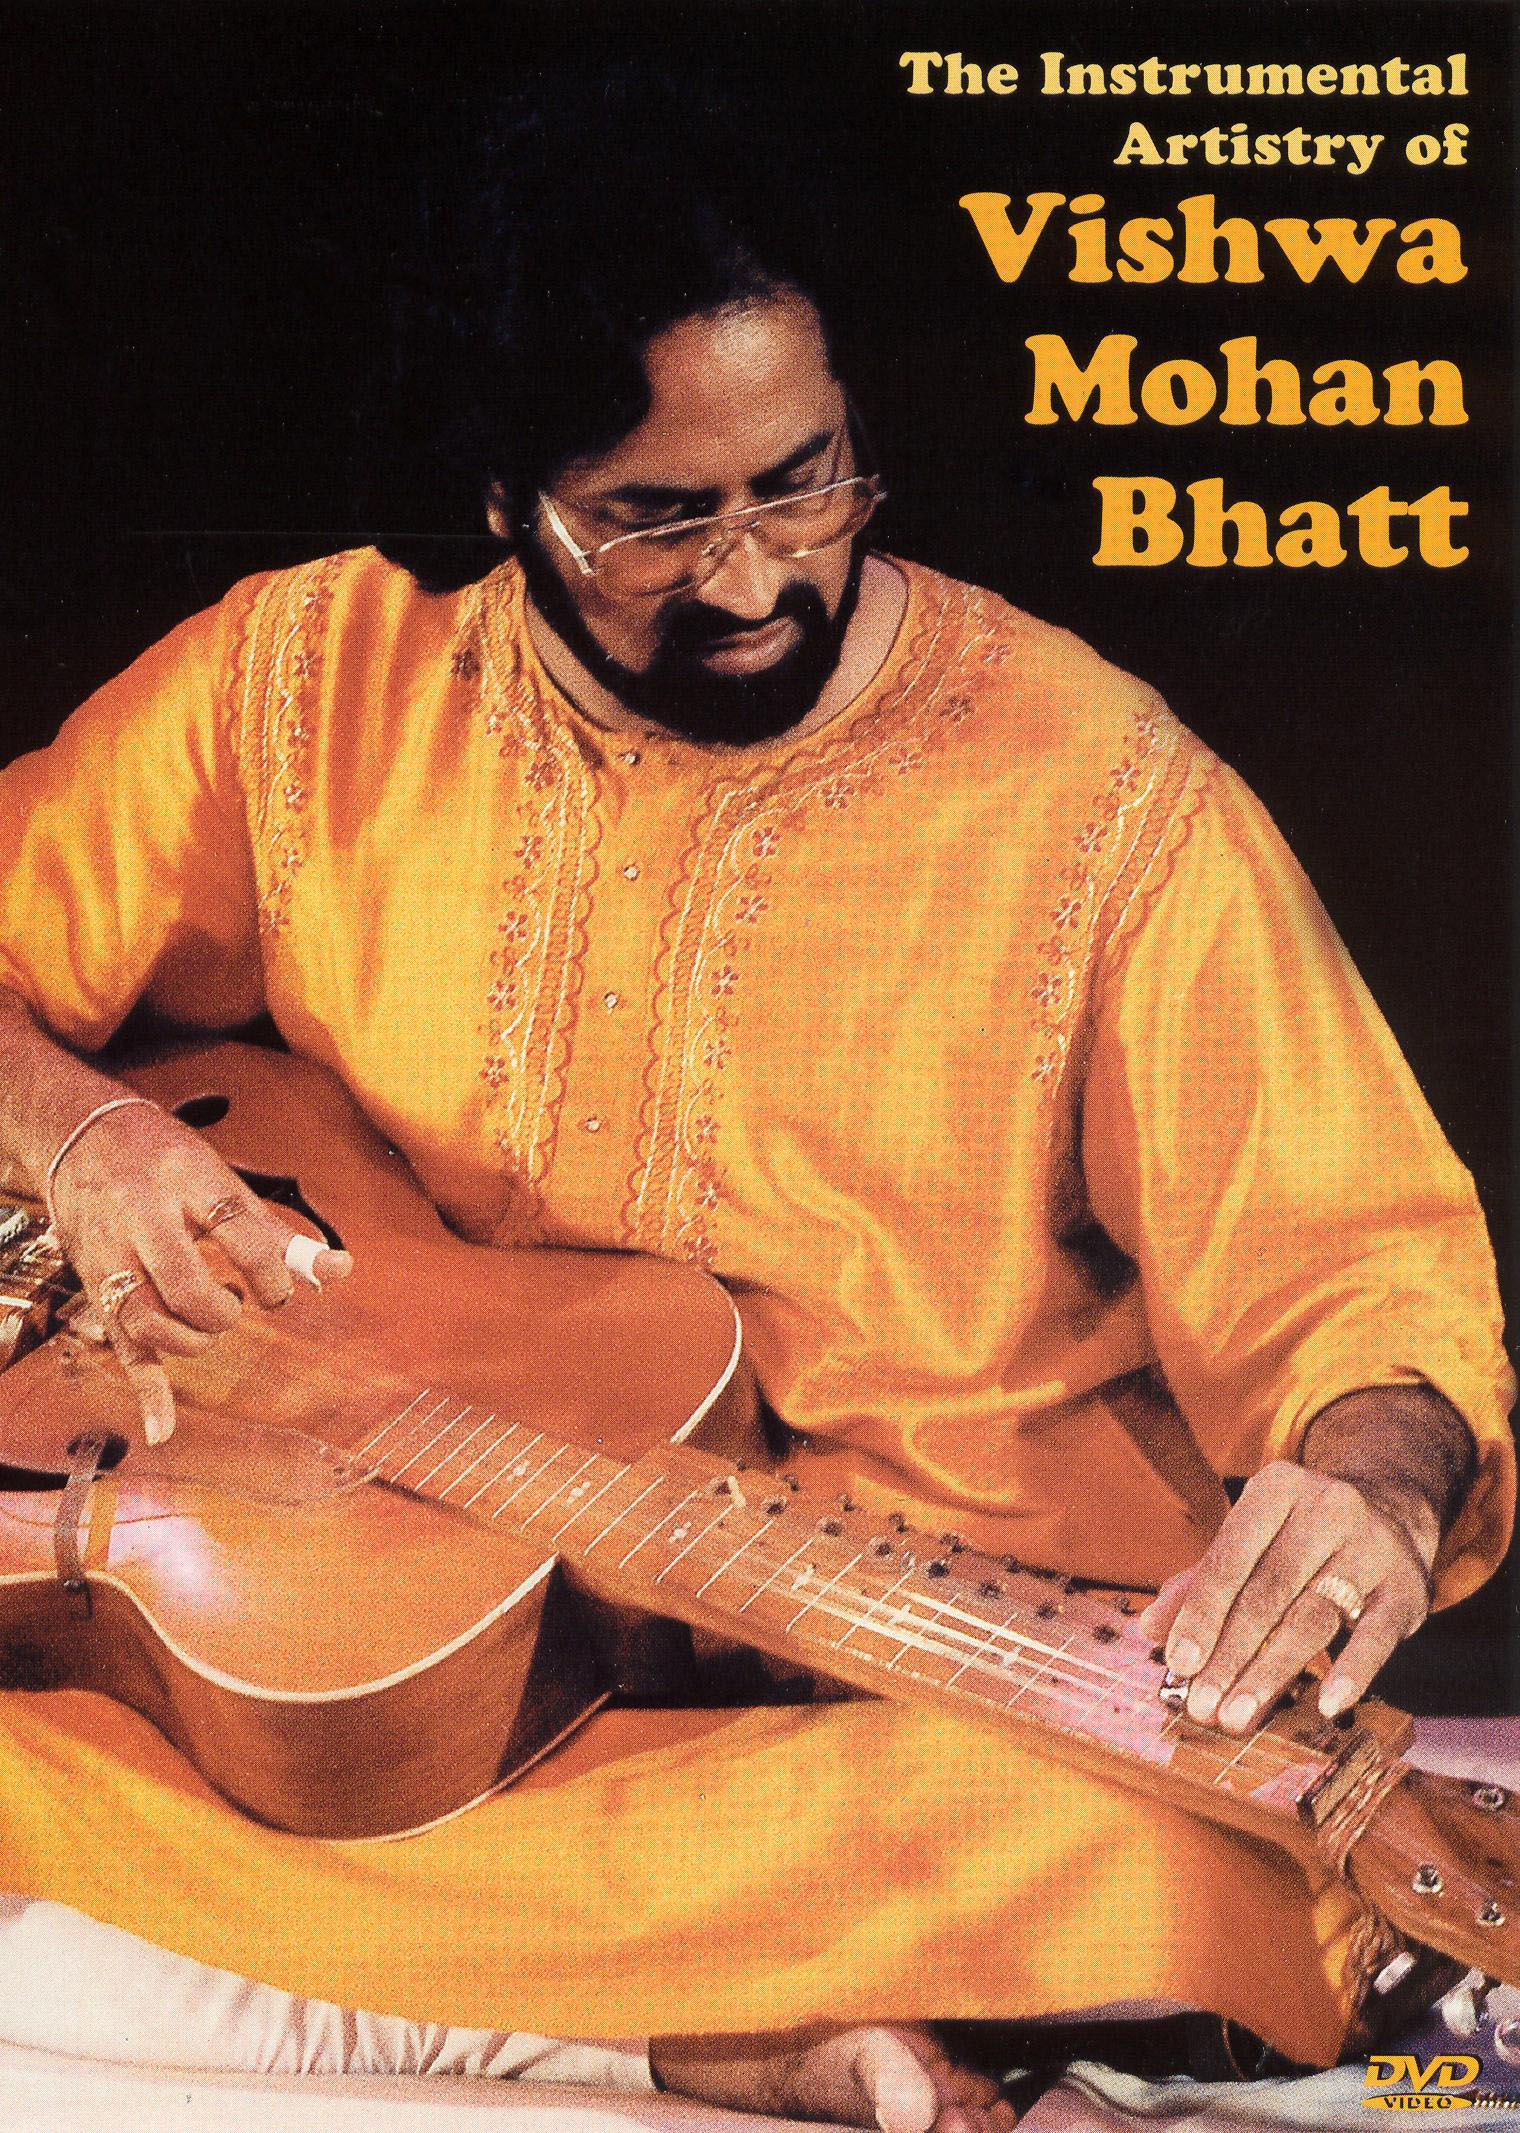 Vishwa Mohan Bhatt: Instrumental Artistry of Vishwa Mohan Bhatt